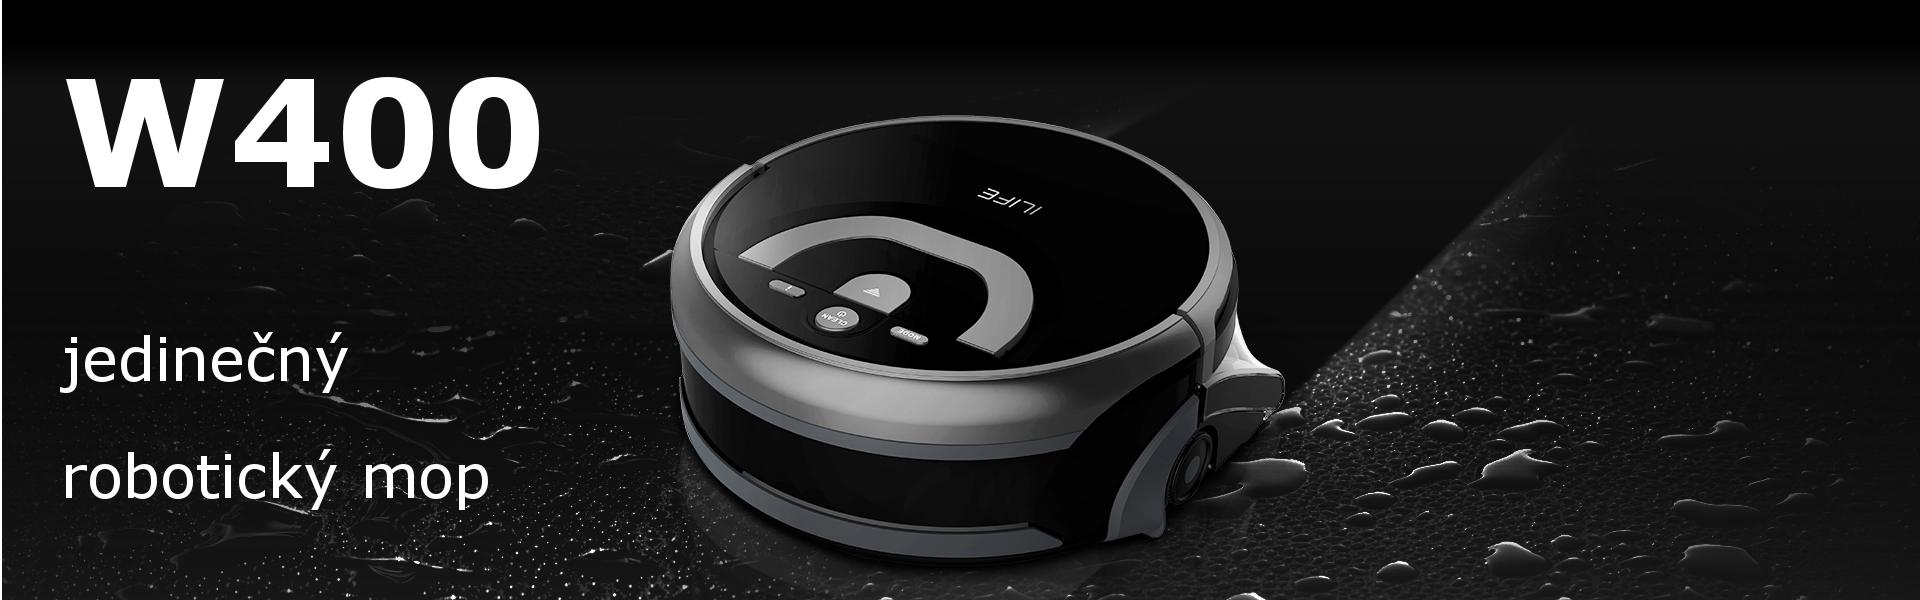 ilife w400 - robotický mop